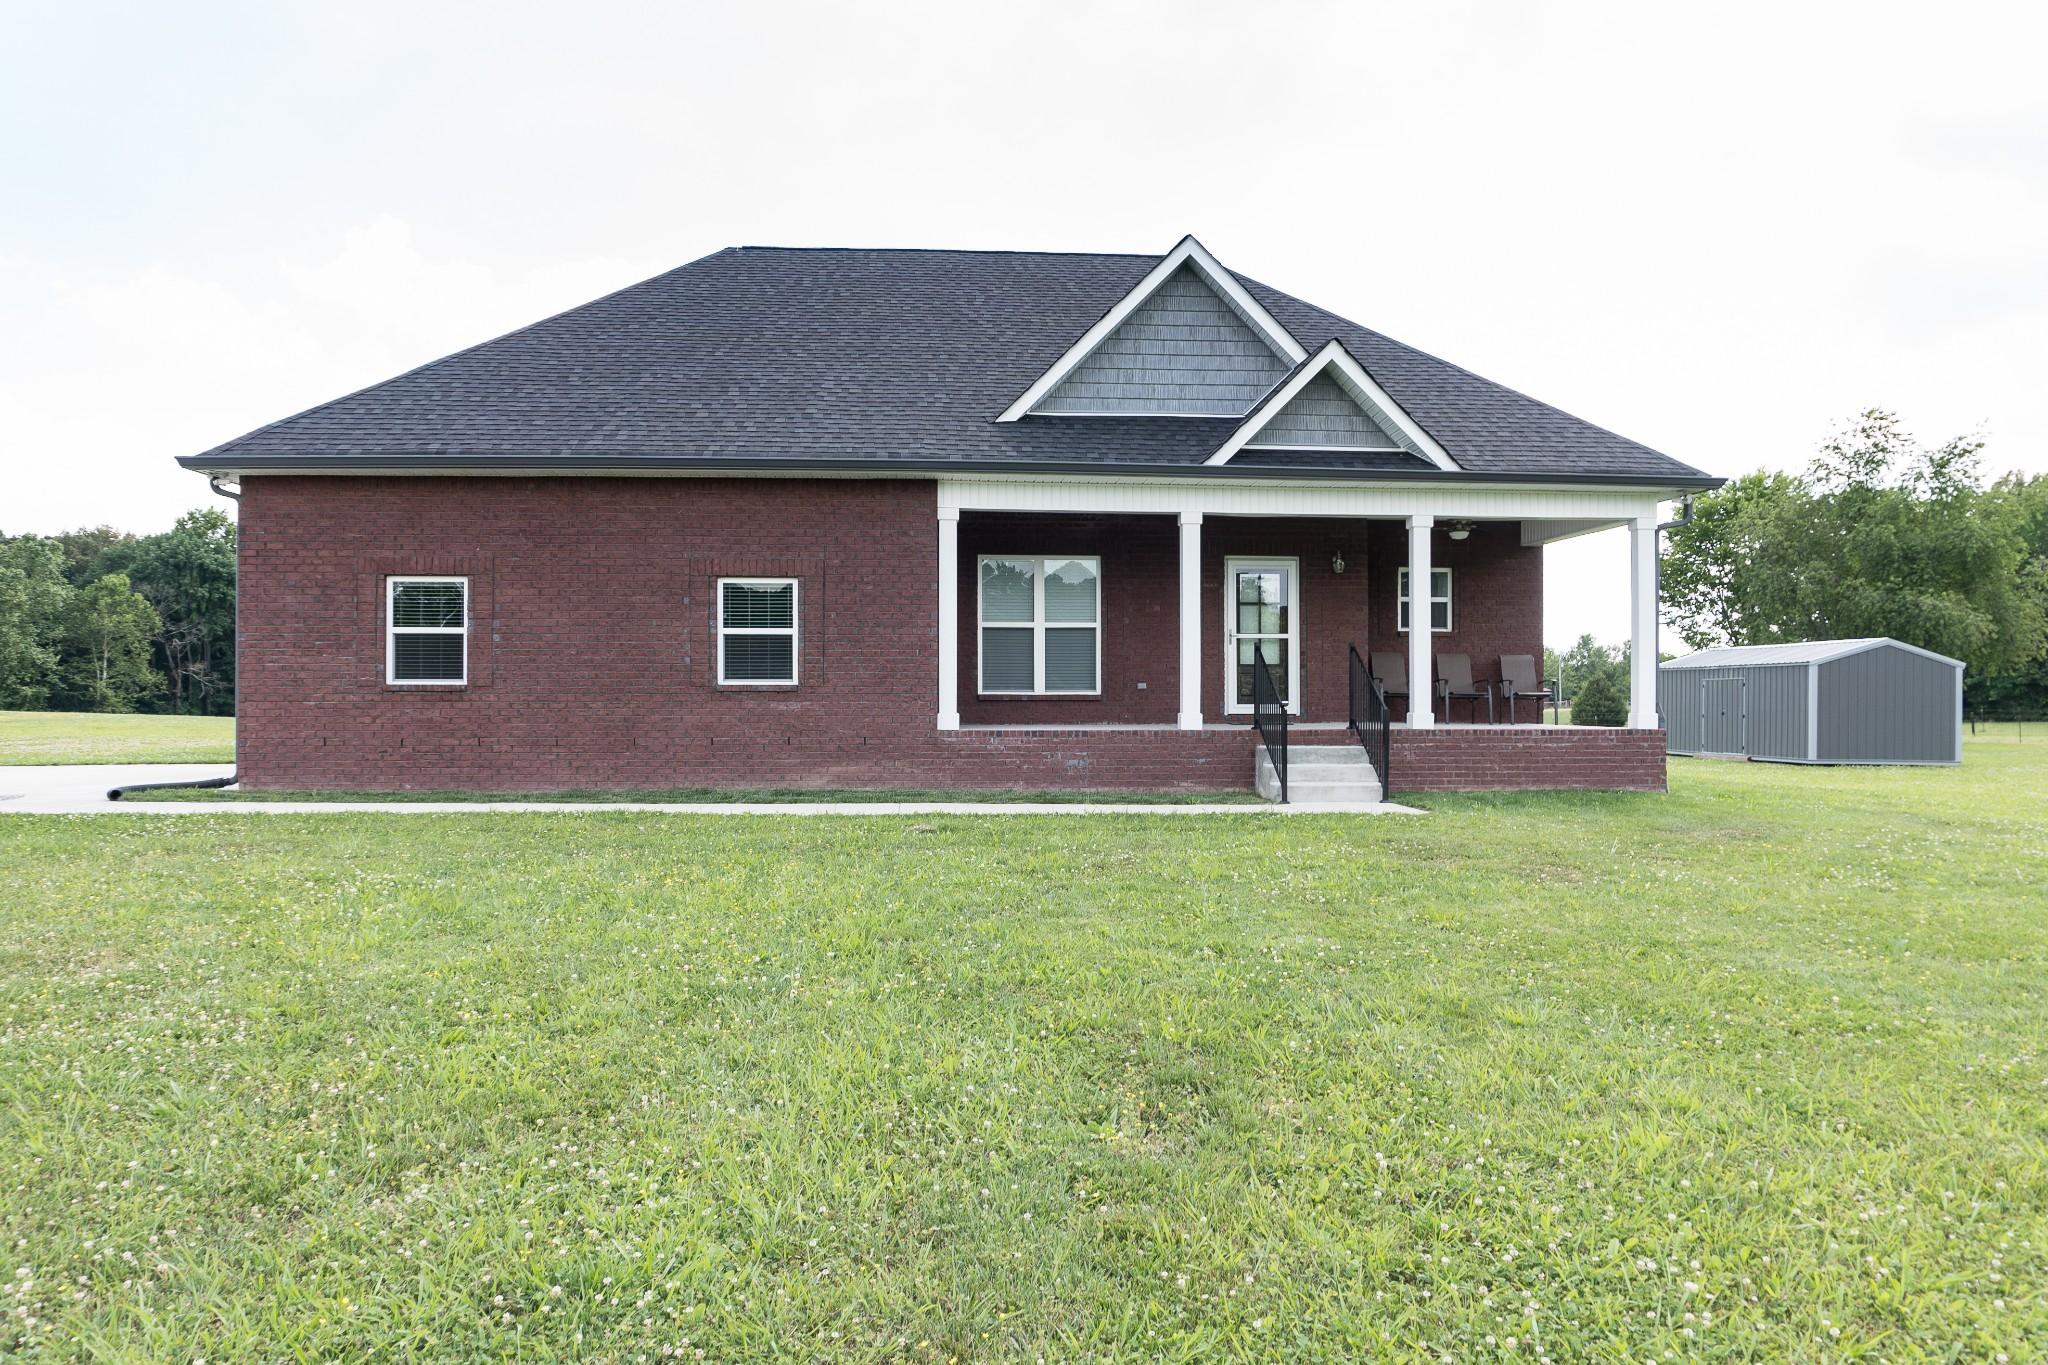 3317 Friendship Rd Property Photo - Cross Plains, TN real estate listing